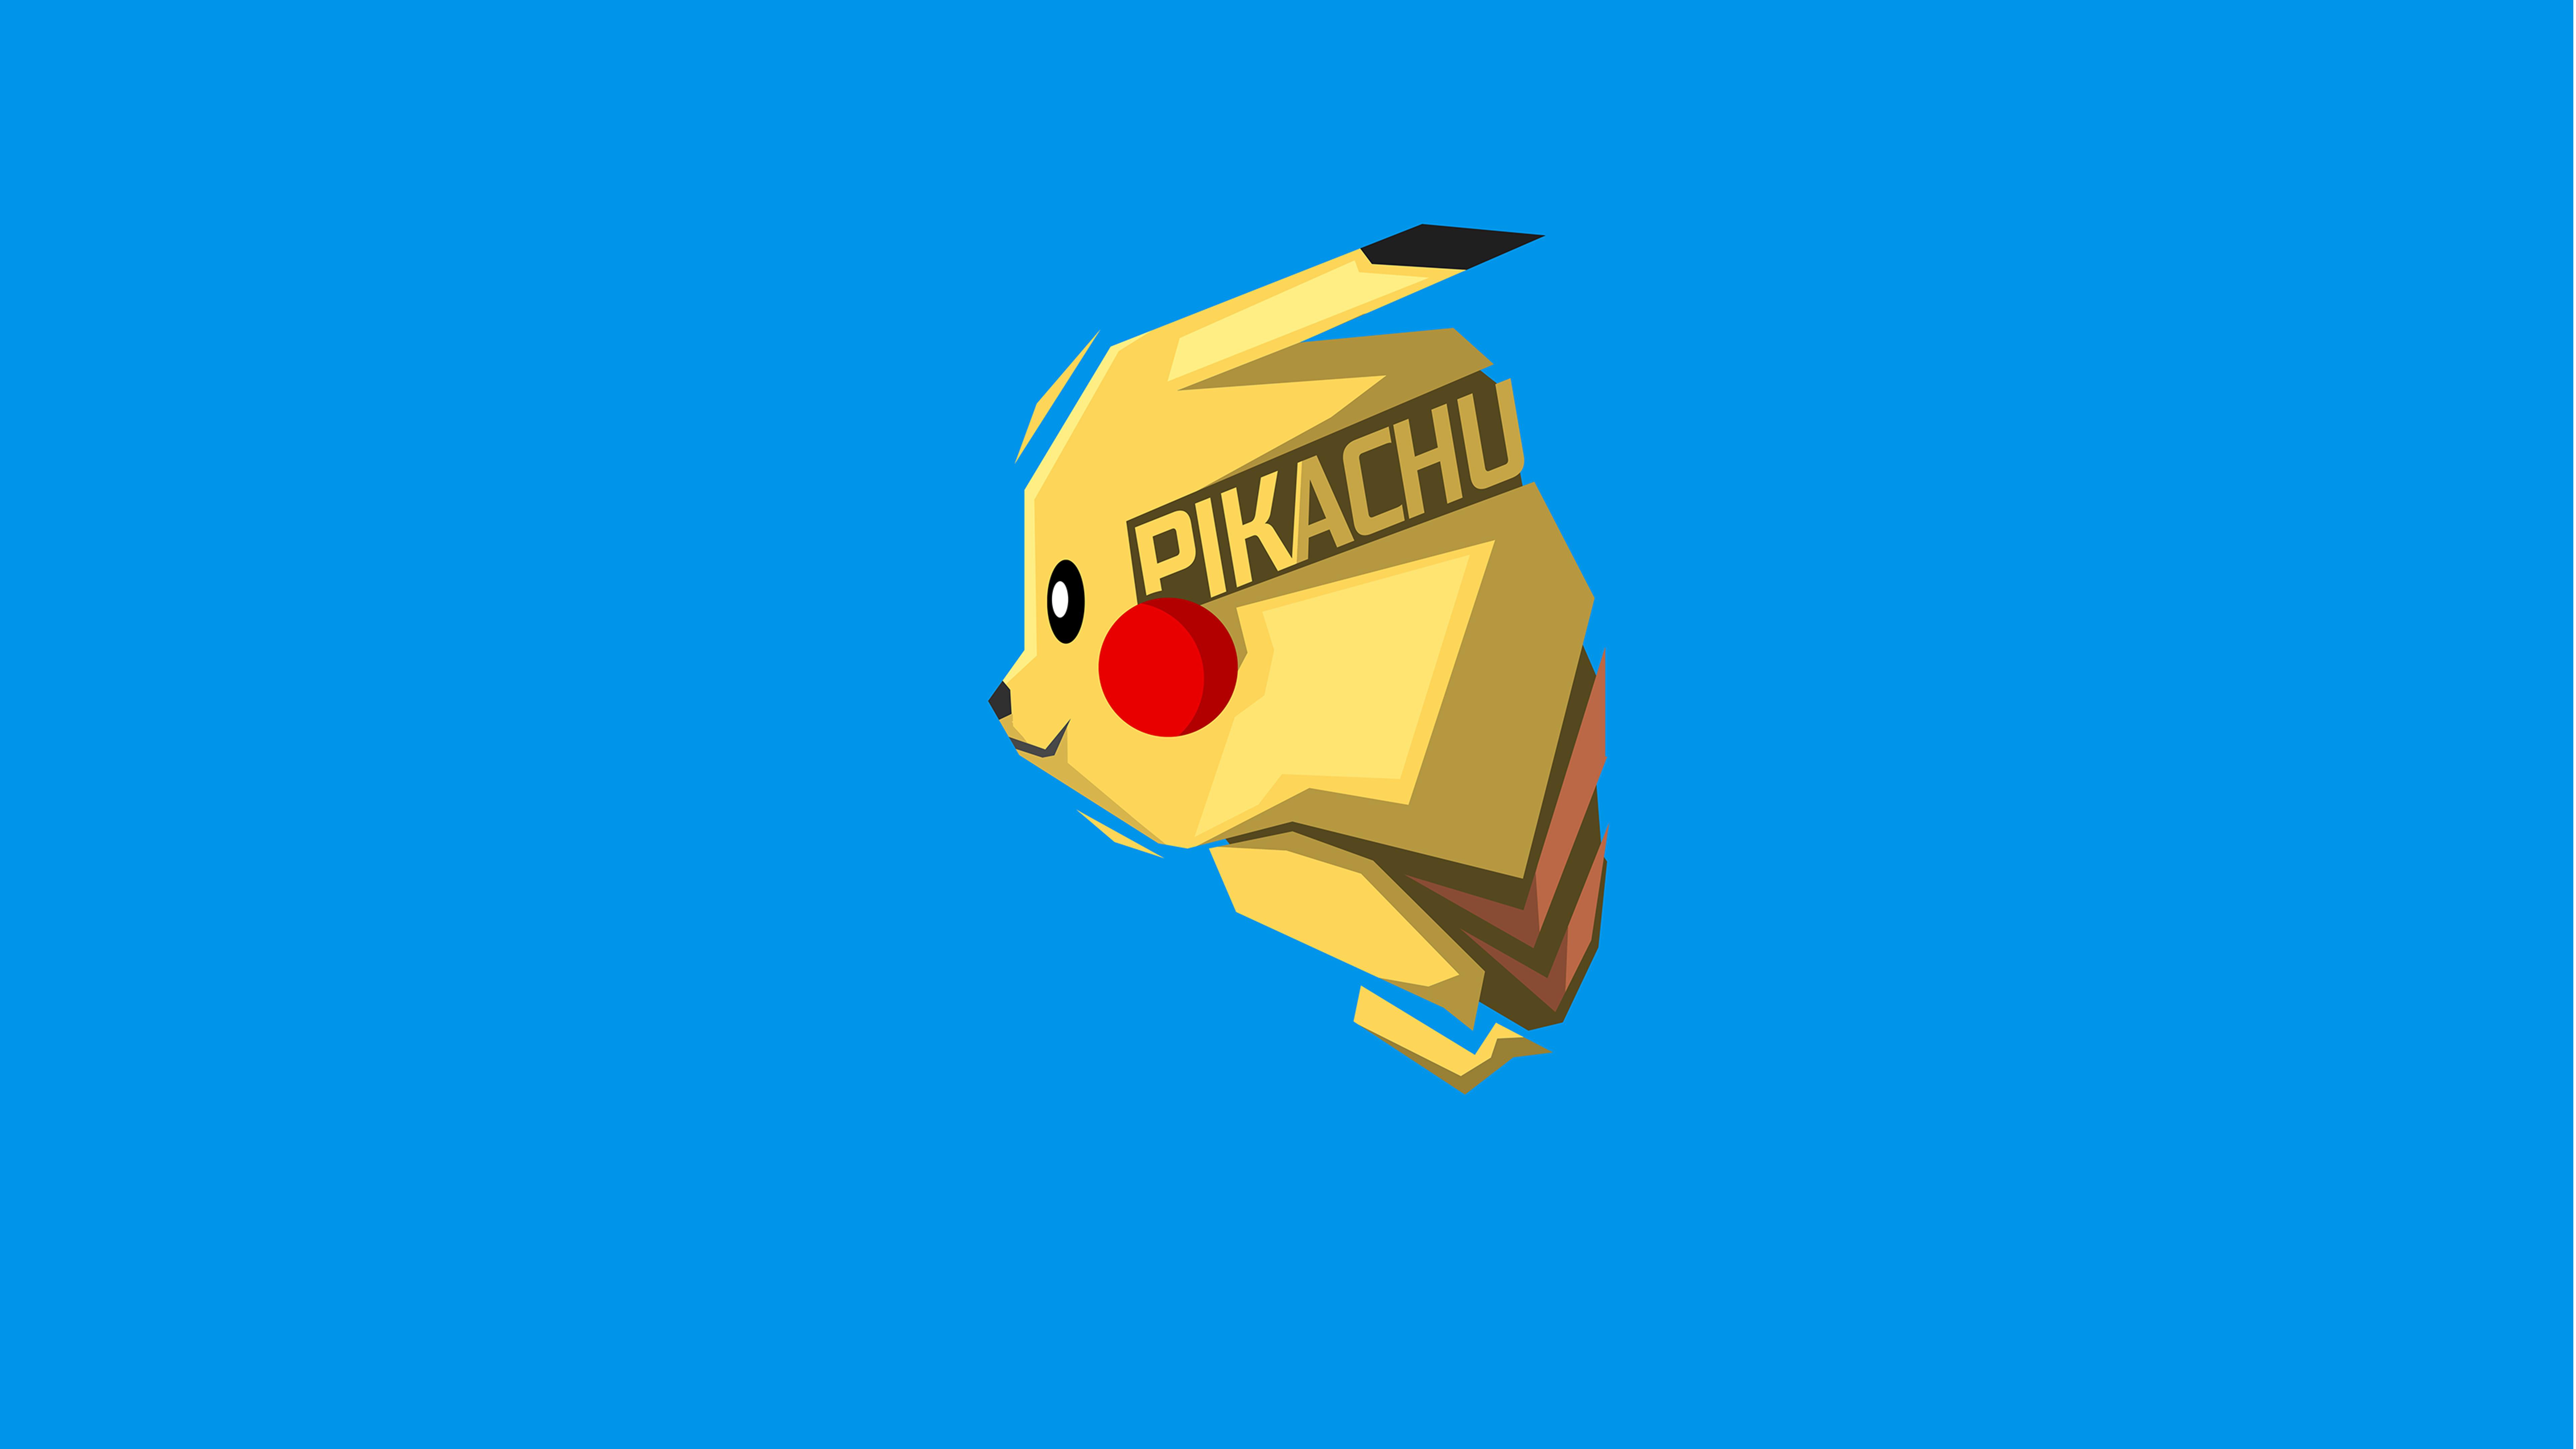 7680x4320 Pikachu Minimalism 8k 8k Hd 4k Wallpapers Images